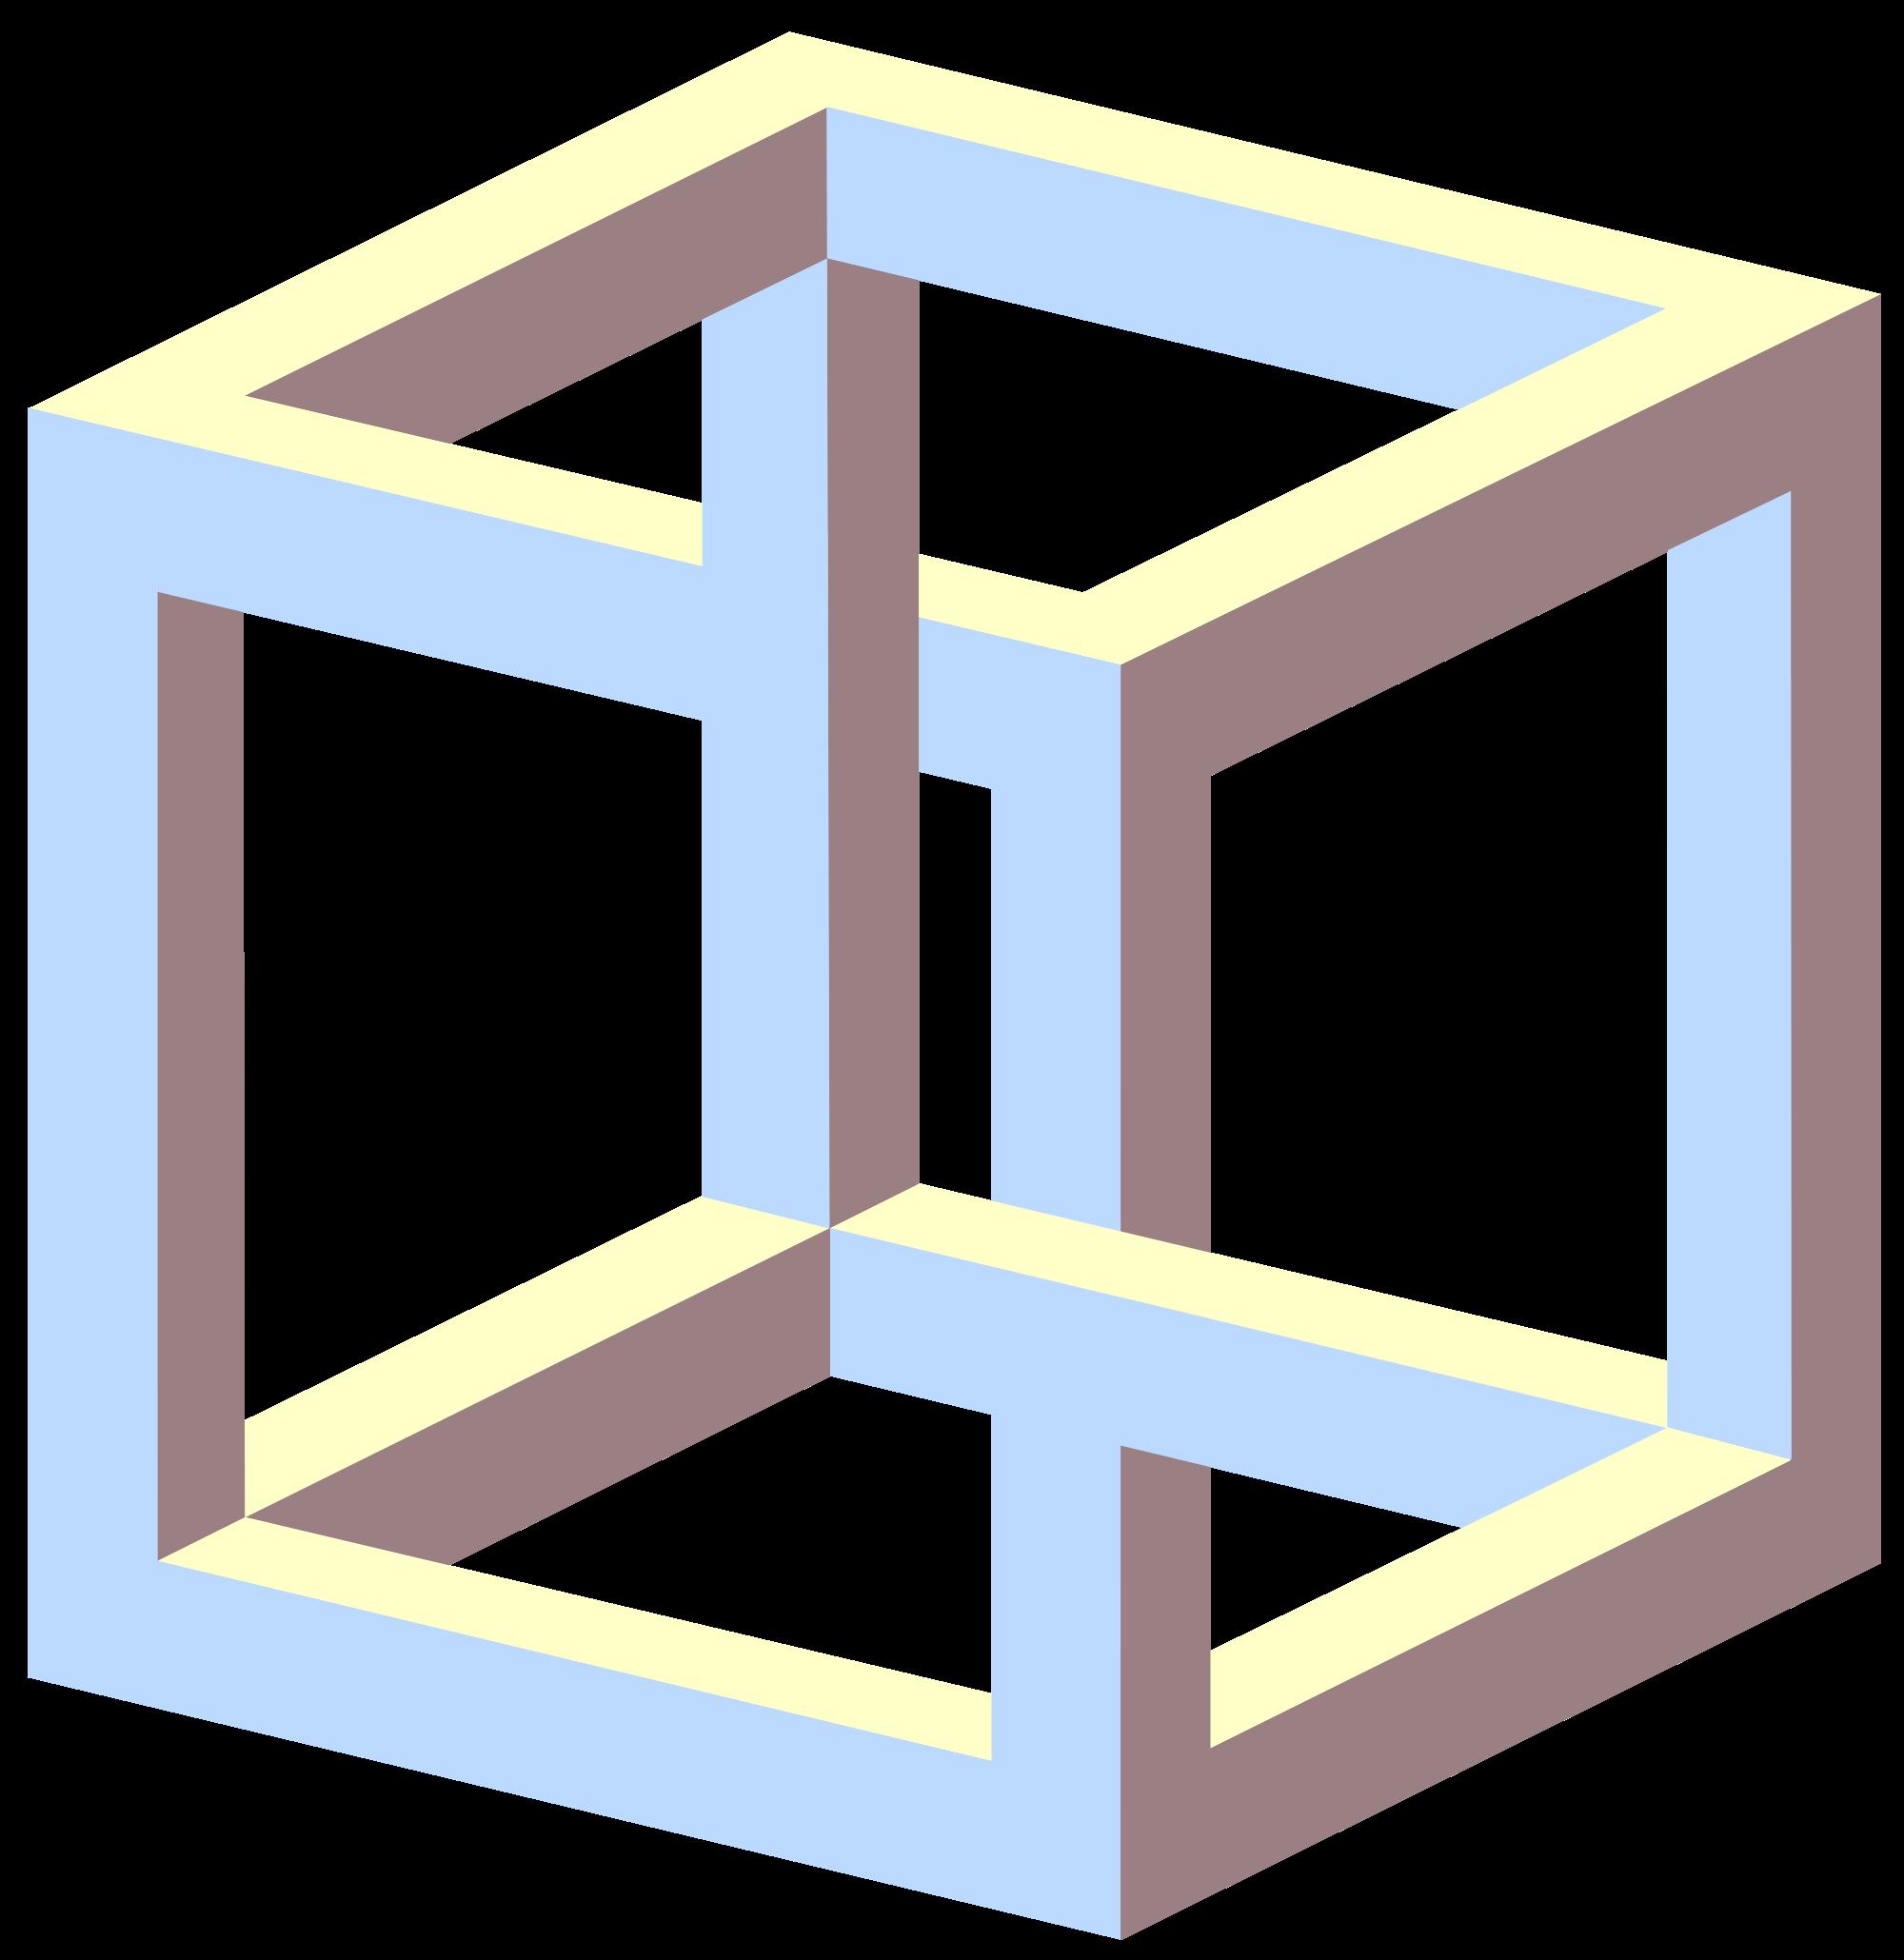 Drawn illusion impossible cube IllusionsEye Recherche Recherche  Awesome